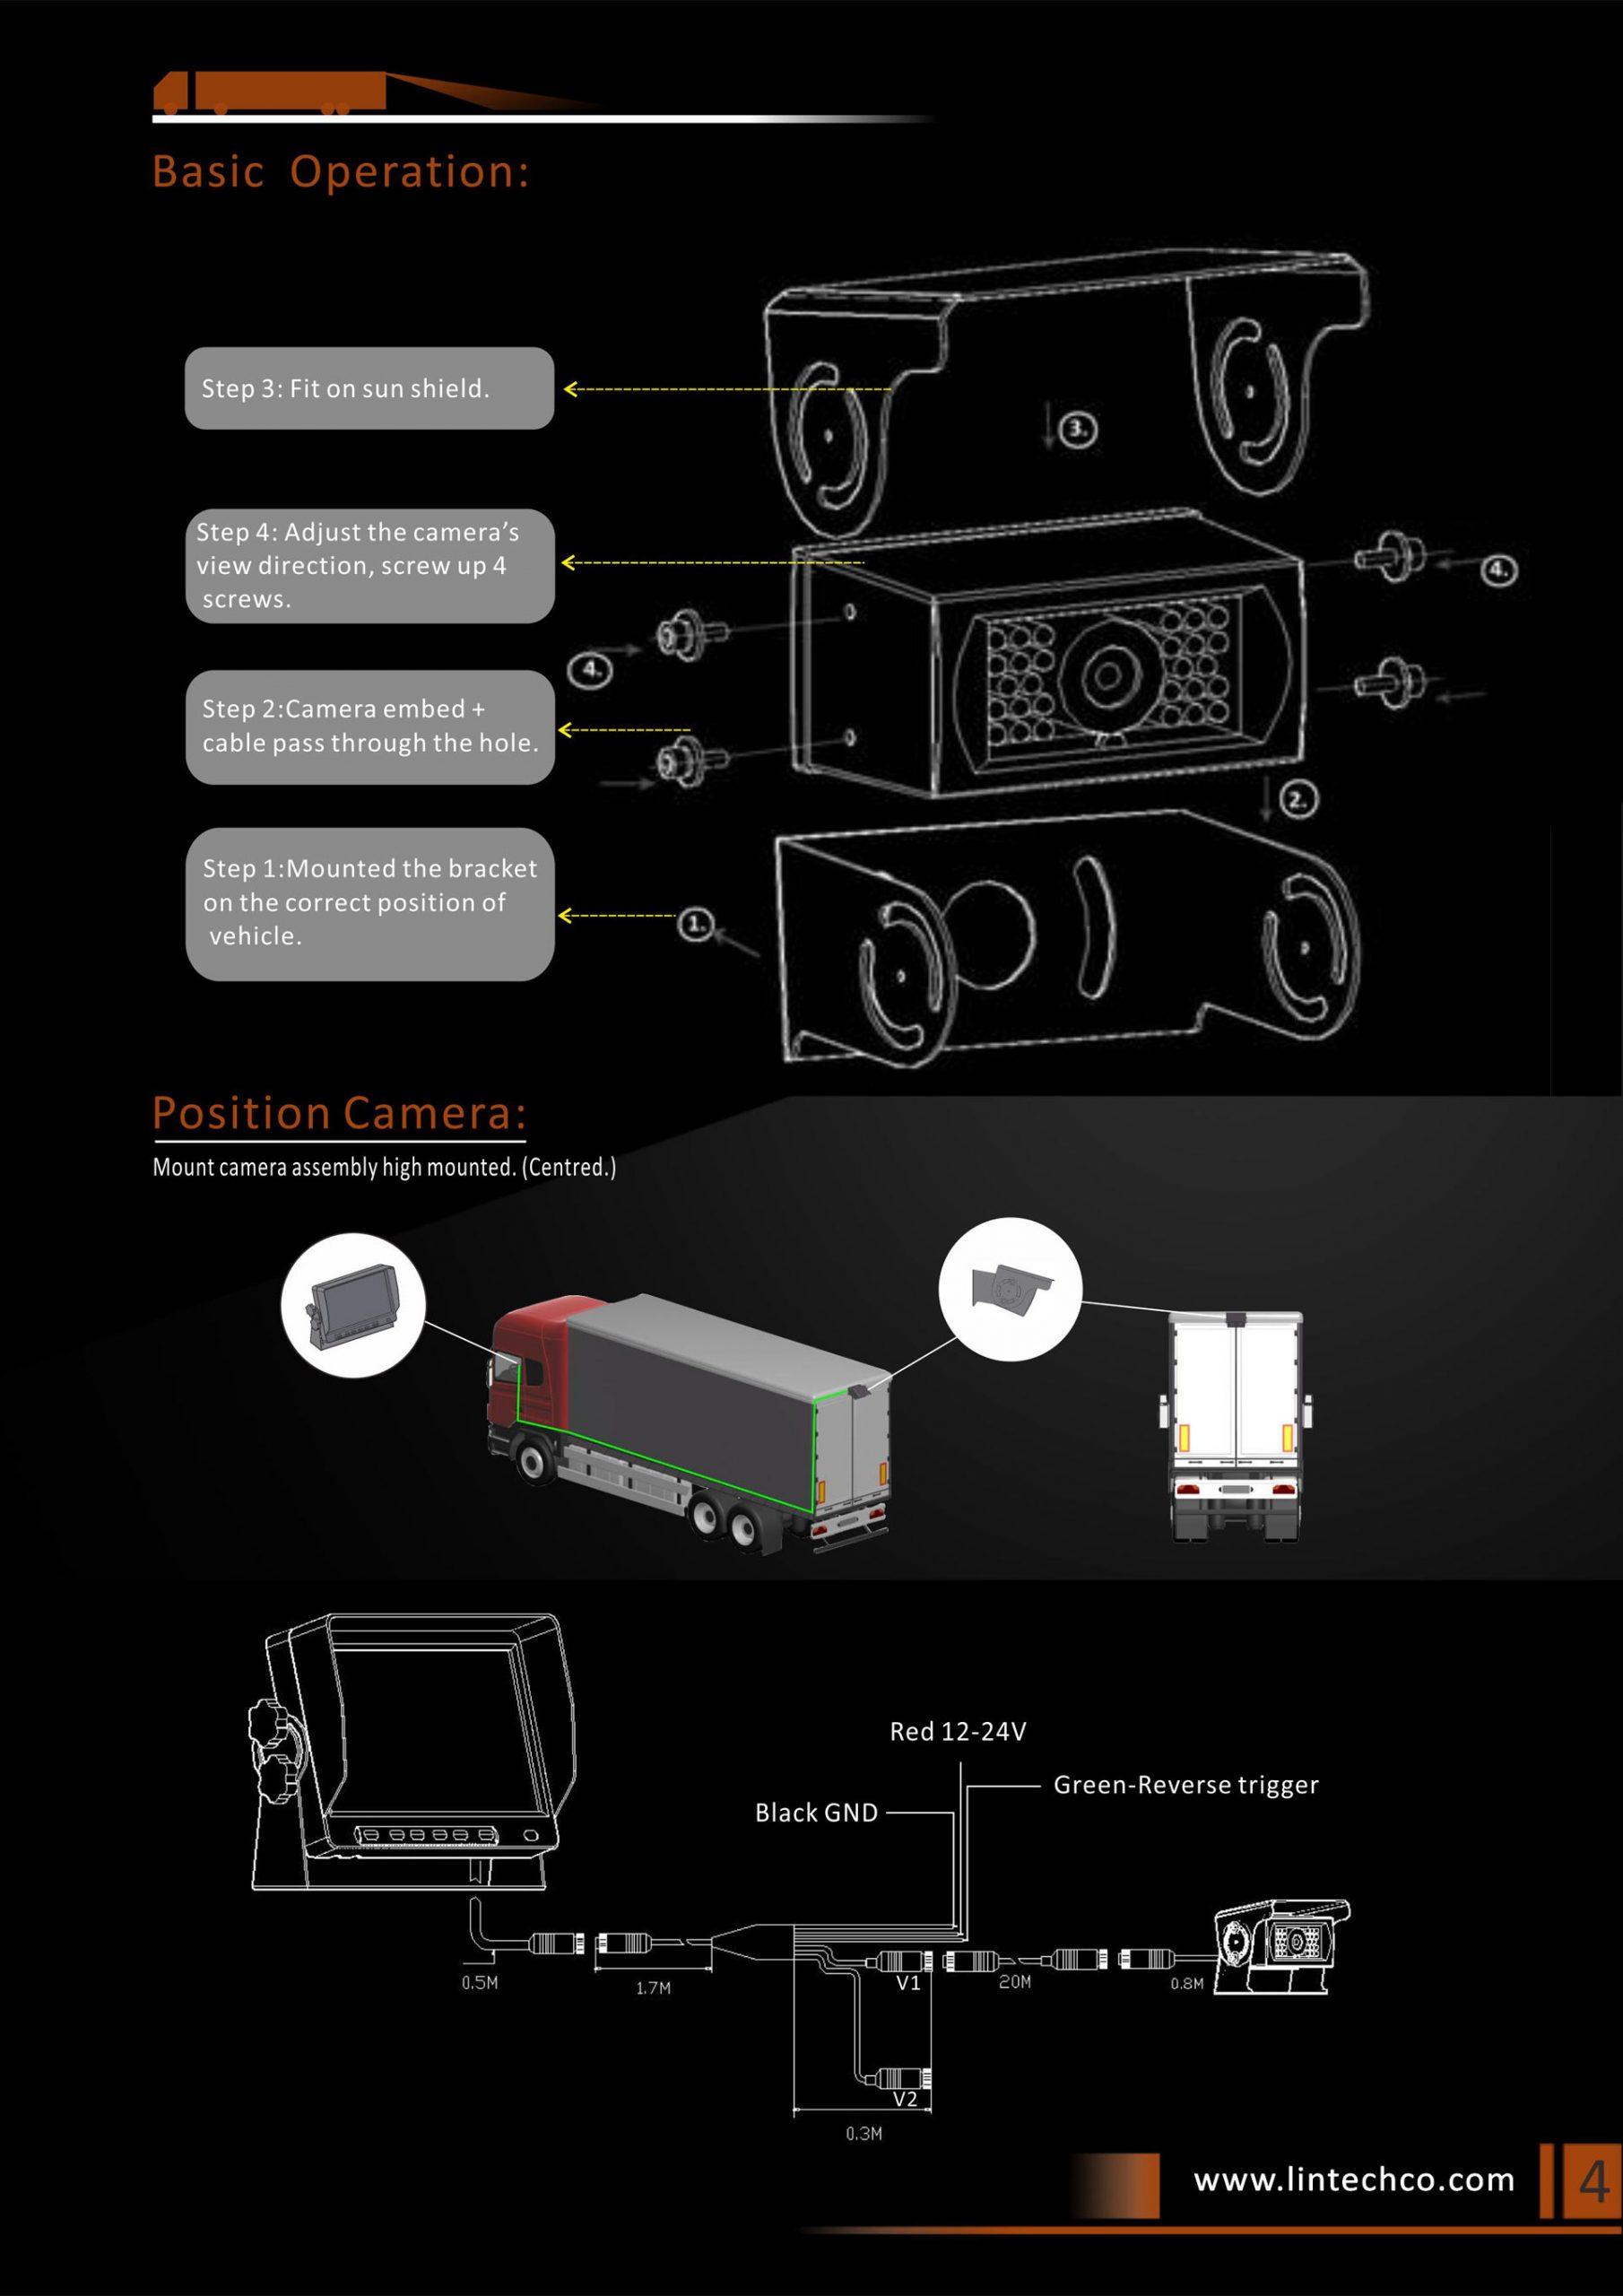 4.Heavy Duty 28pcs IR LED Night Vision Enhanced IP69 Waterproof Backup Camera